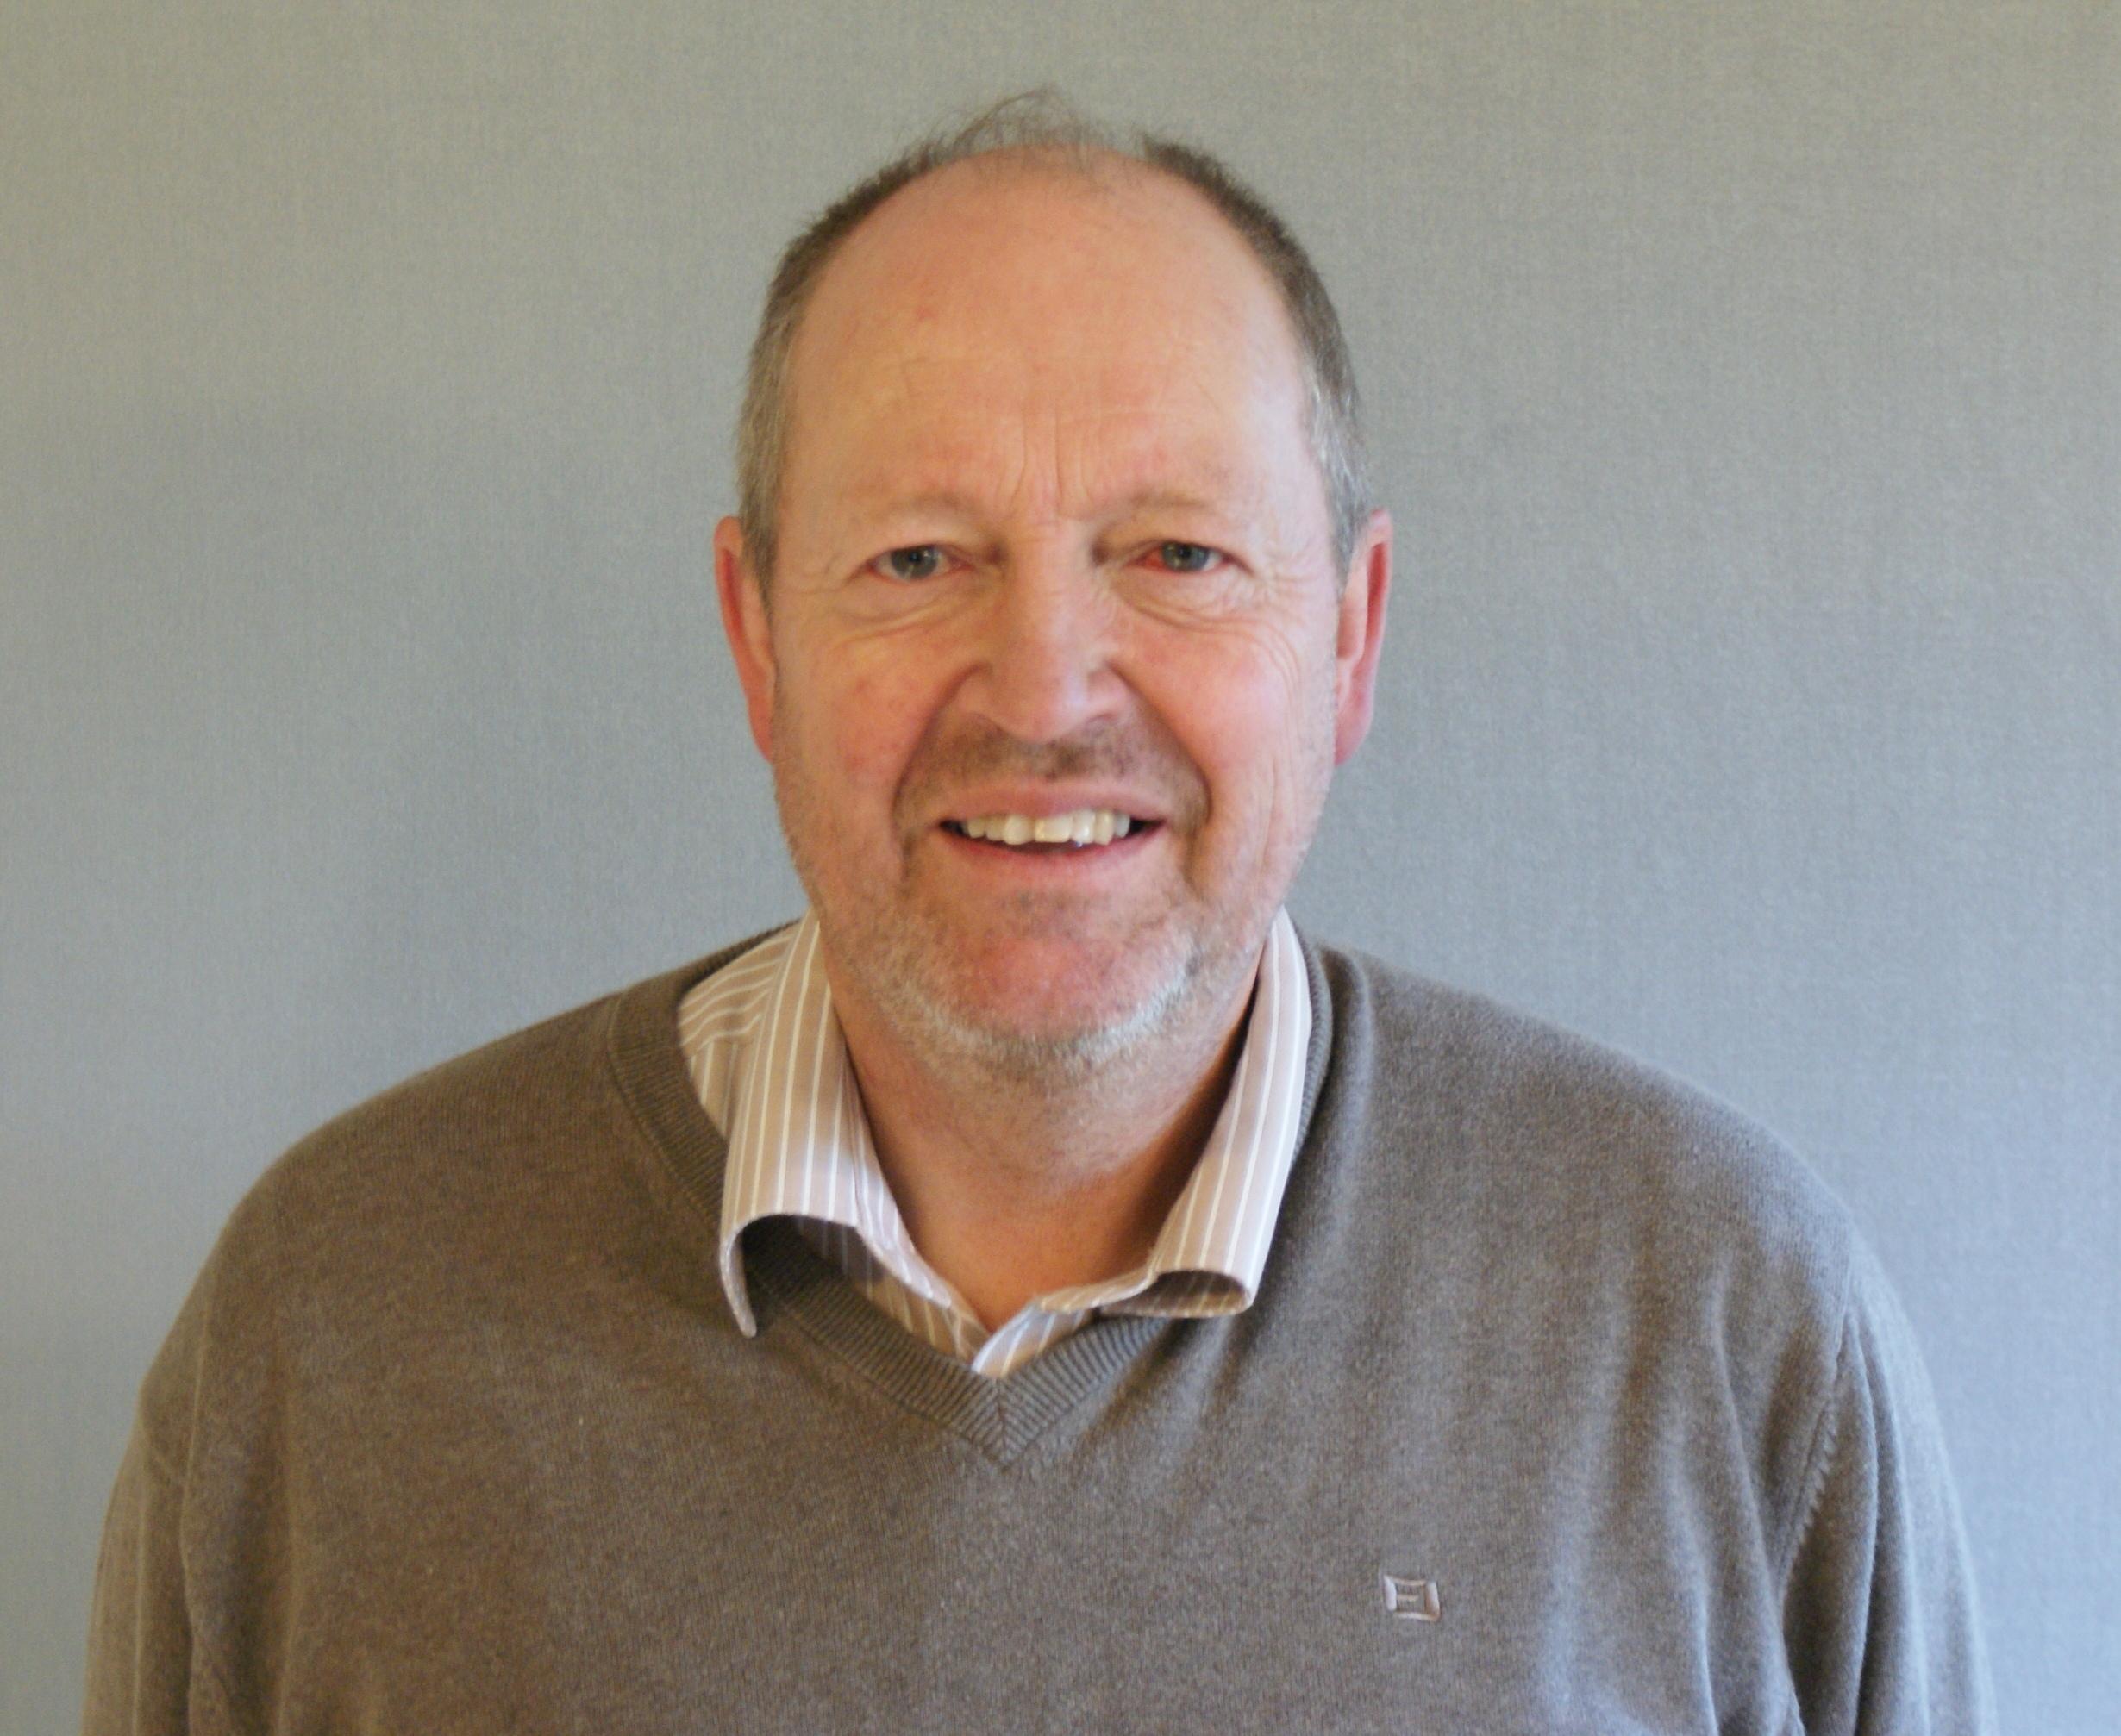 Carsten Andersen Næstformand foreningen, Formand Jagthundeudvalget & i NFC`s bestyrelse